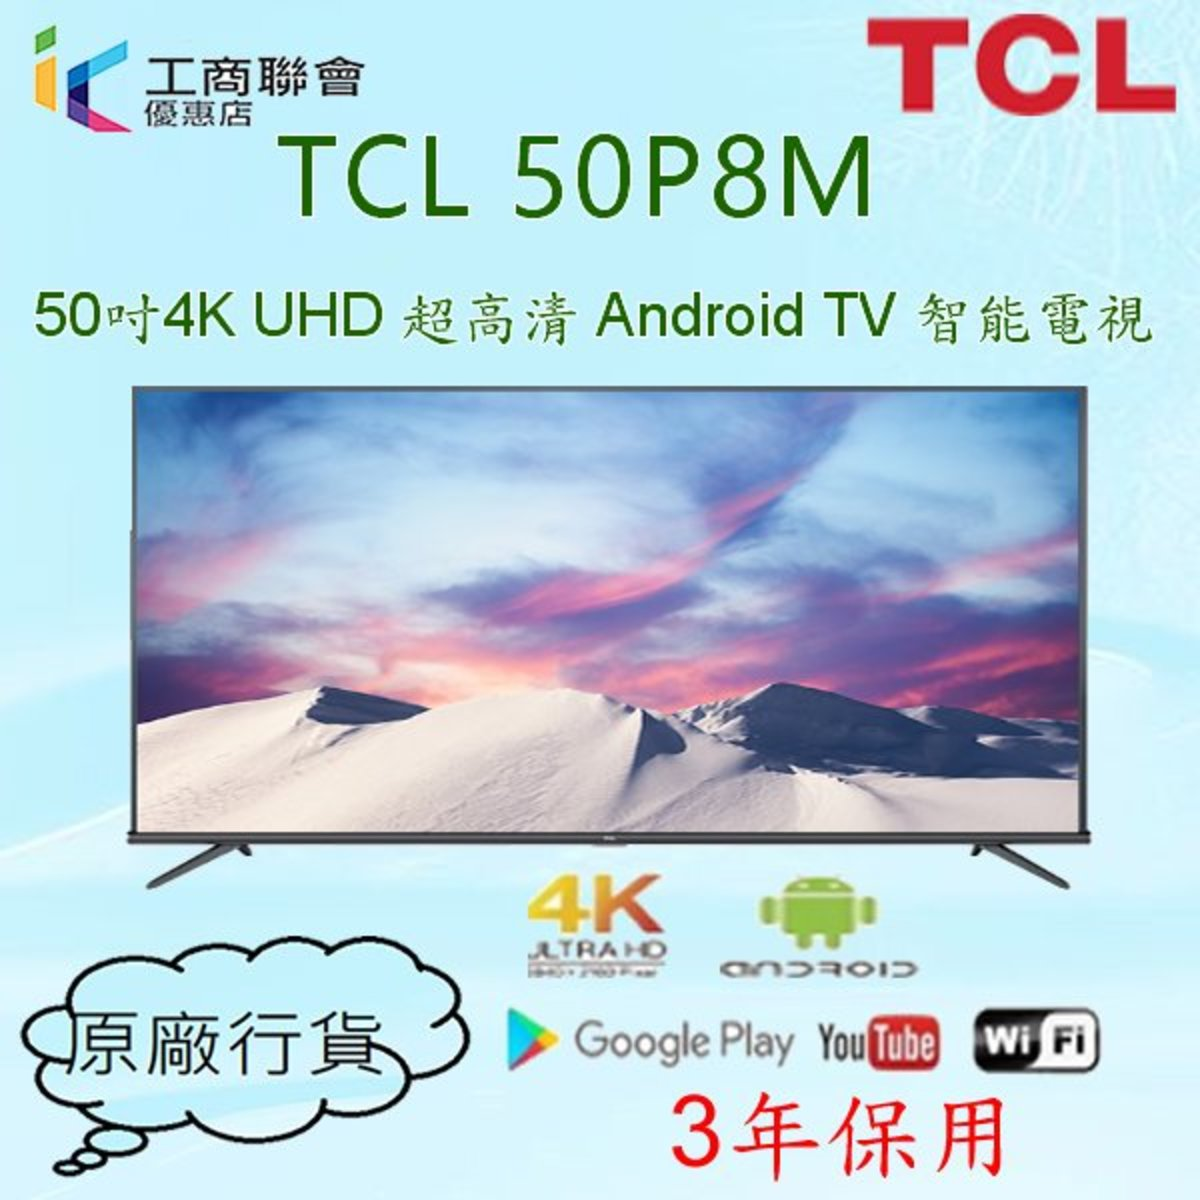 "50P8M 50""4K UHD 超高清 Android TV 智能電視"